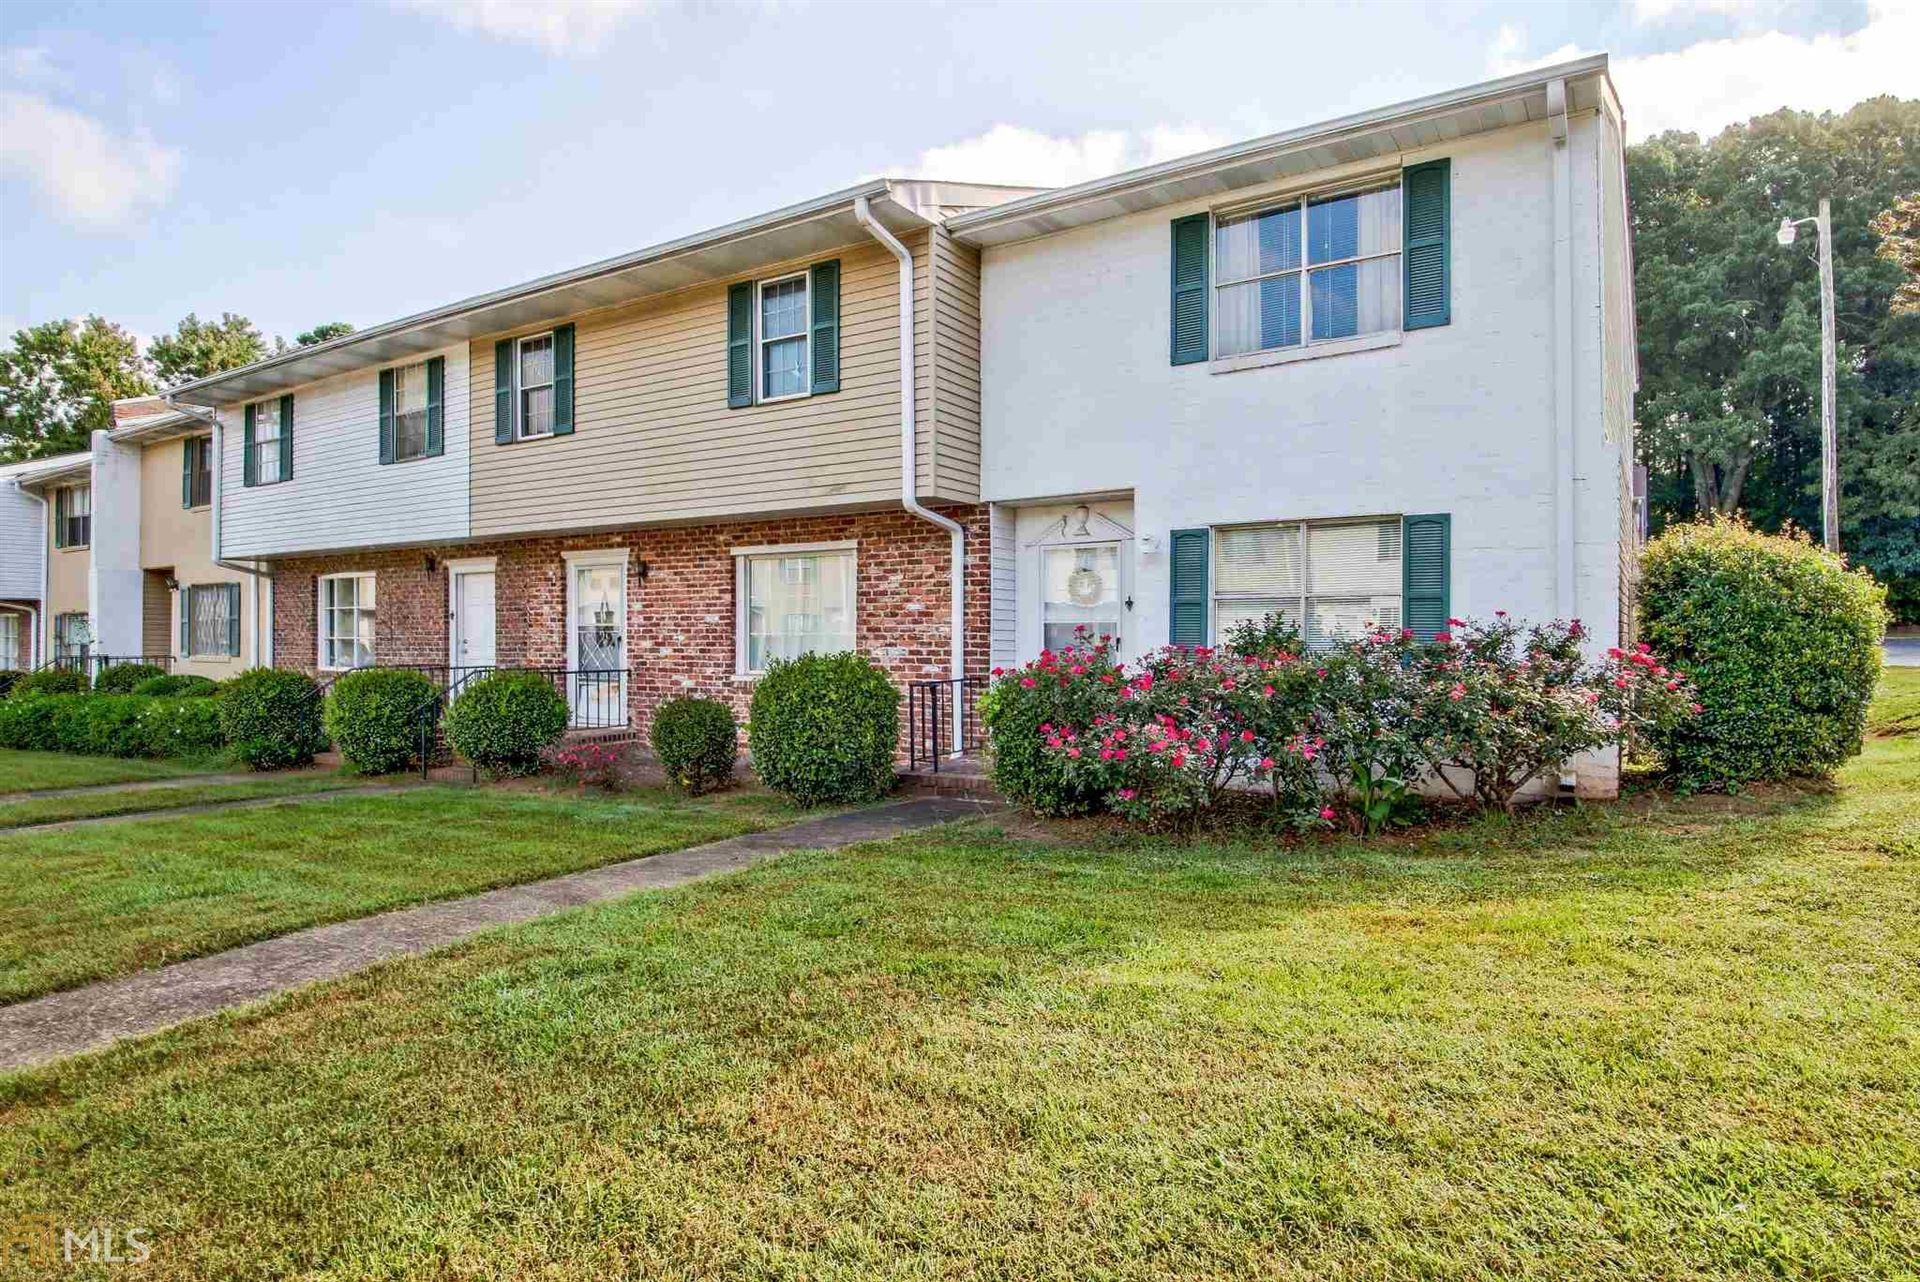 501 Carlton Rd, Palmetto, GA 30268 - MLS#: 8860714